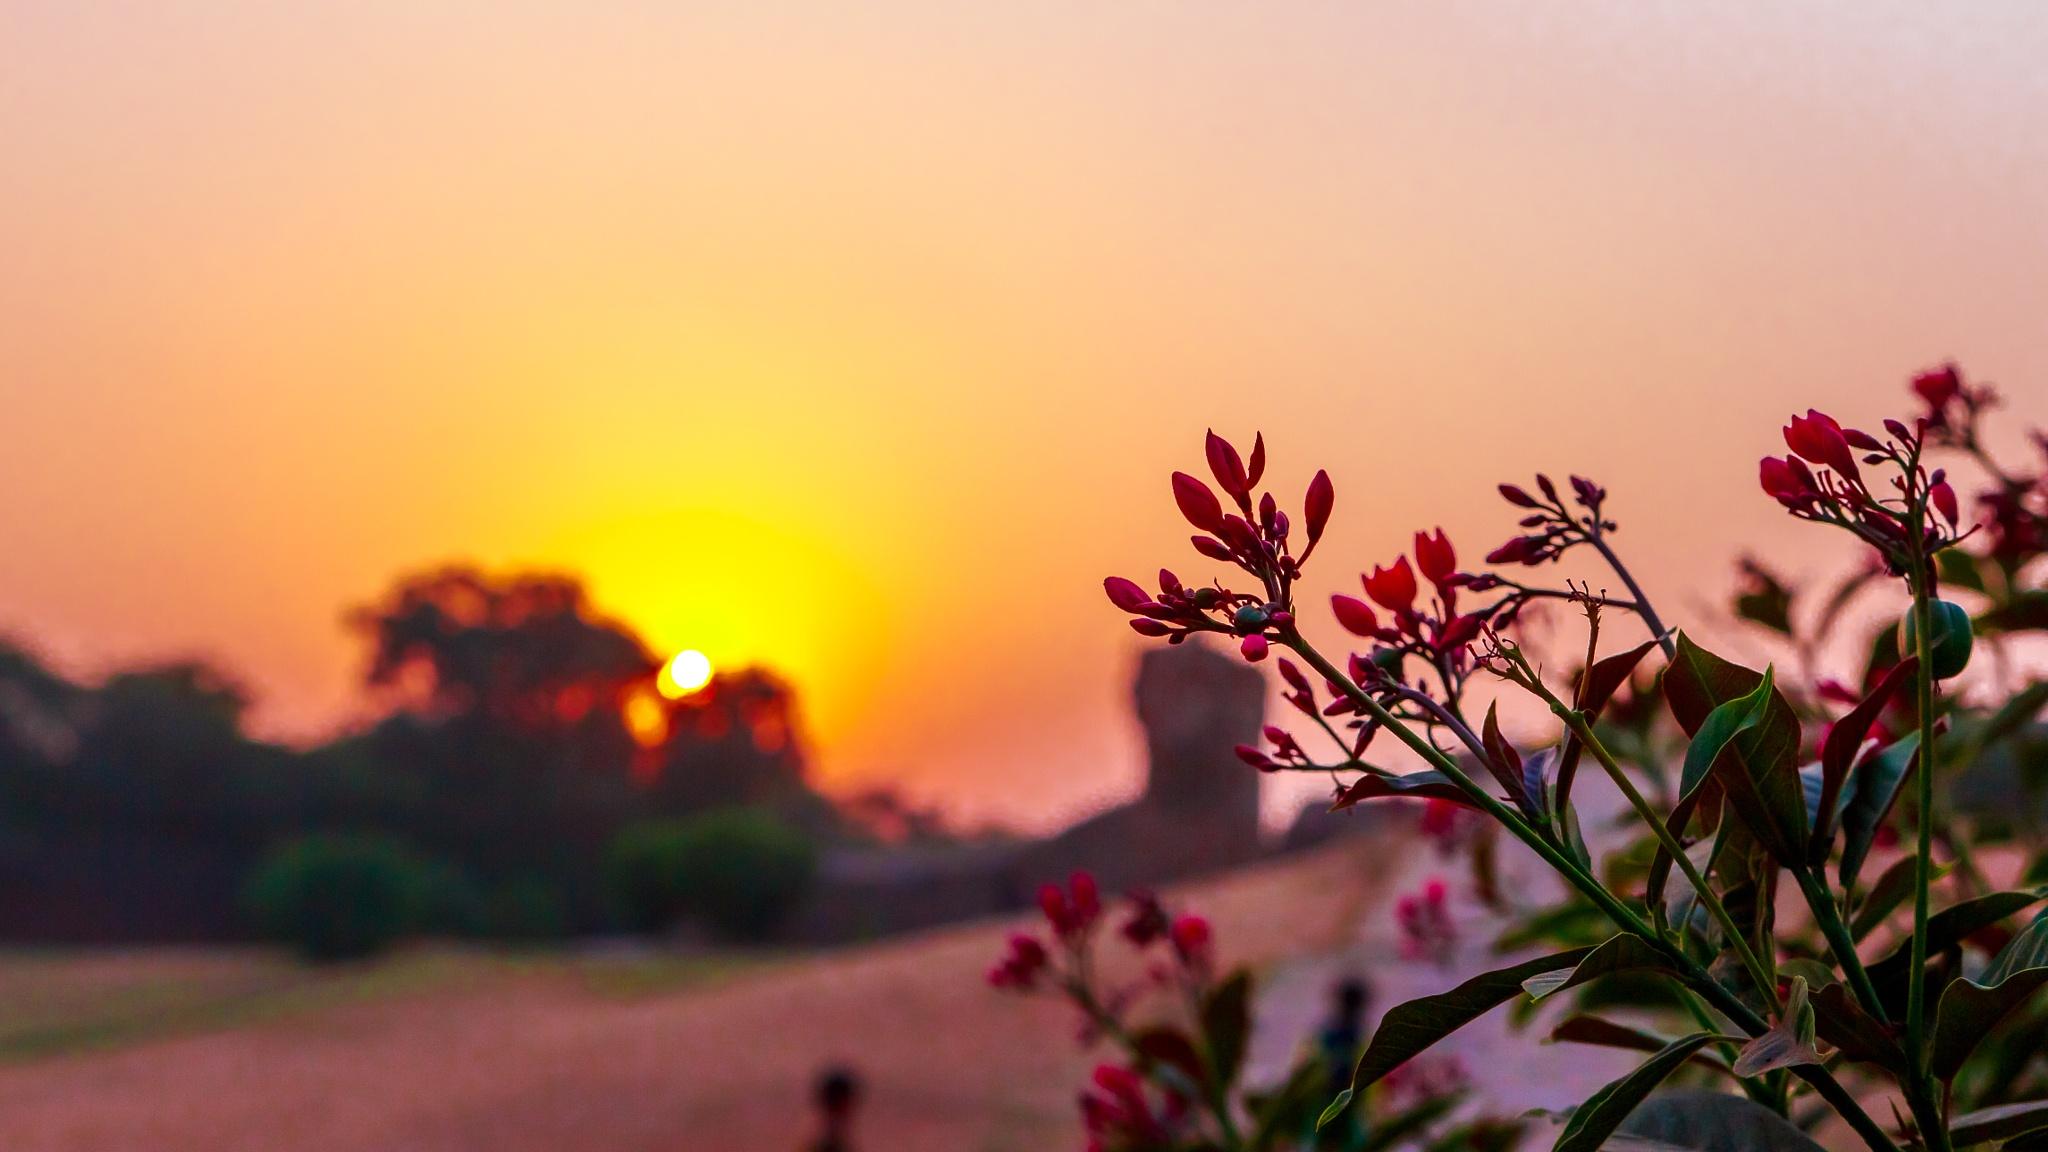 Sunset at Qutub Minar by Anurag Banerjee